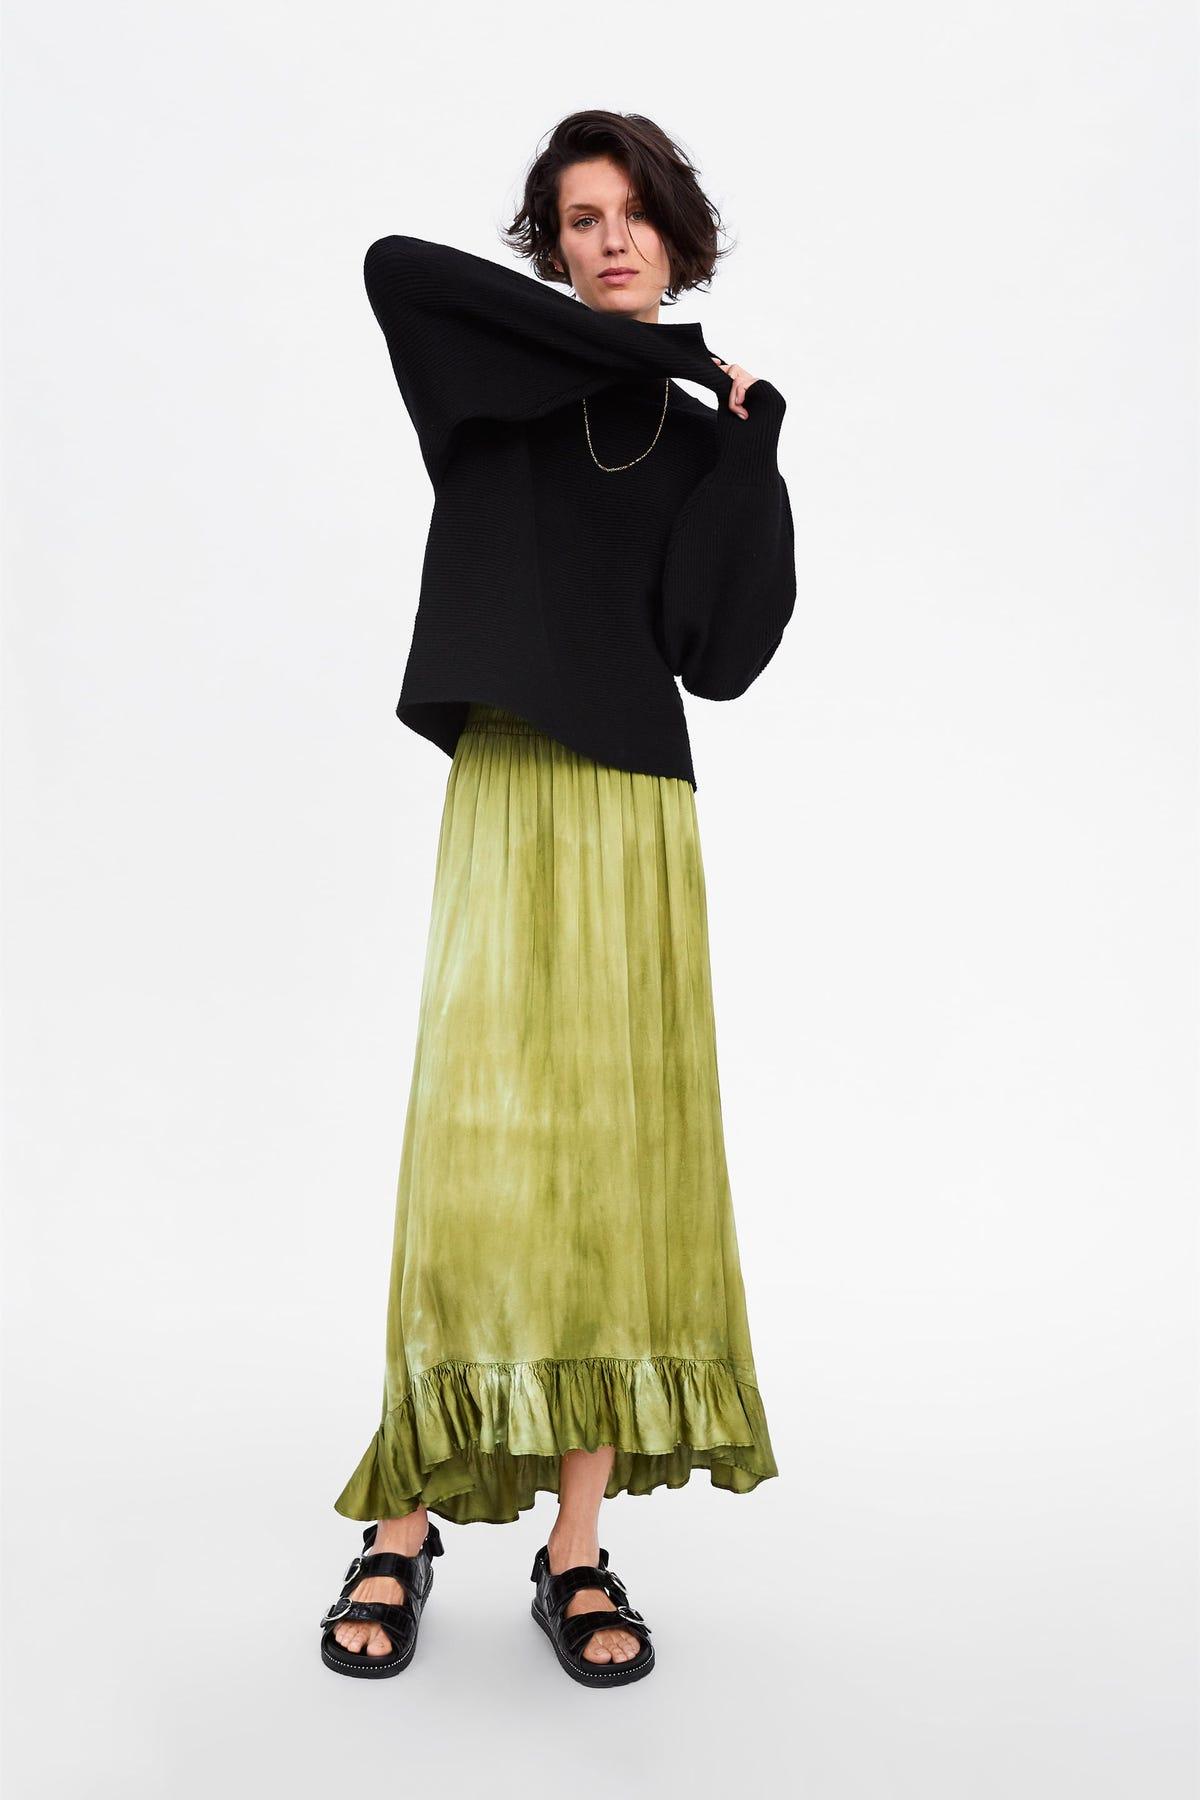 438d49d6a9 Zara Annual Summer Sale 2019 Women Clothes, Accessories